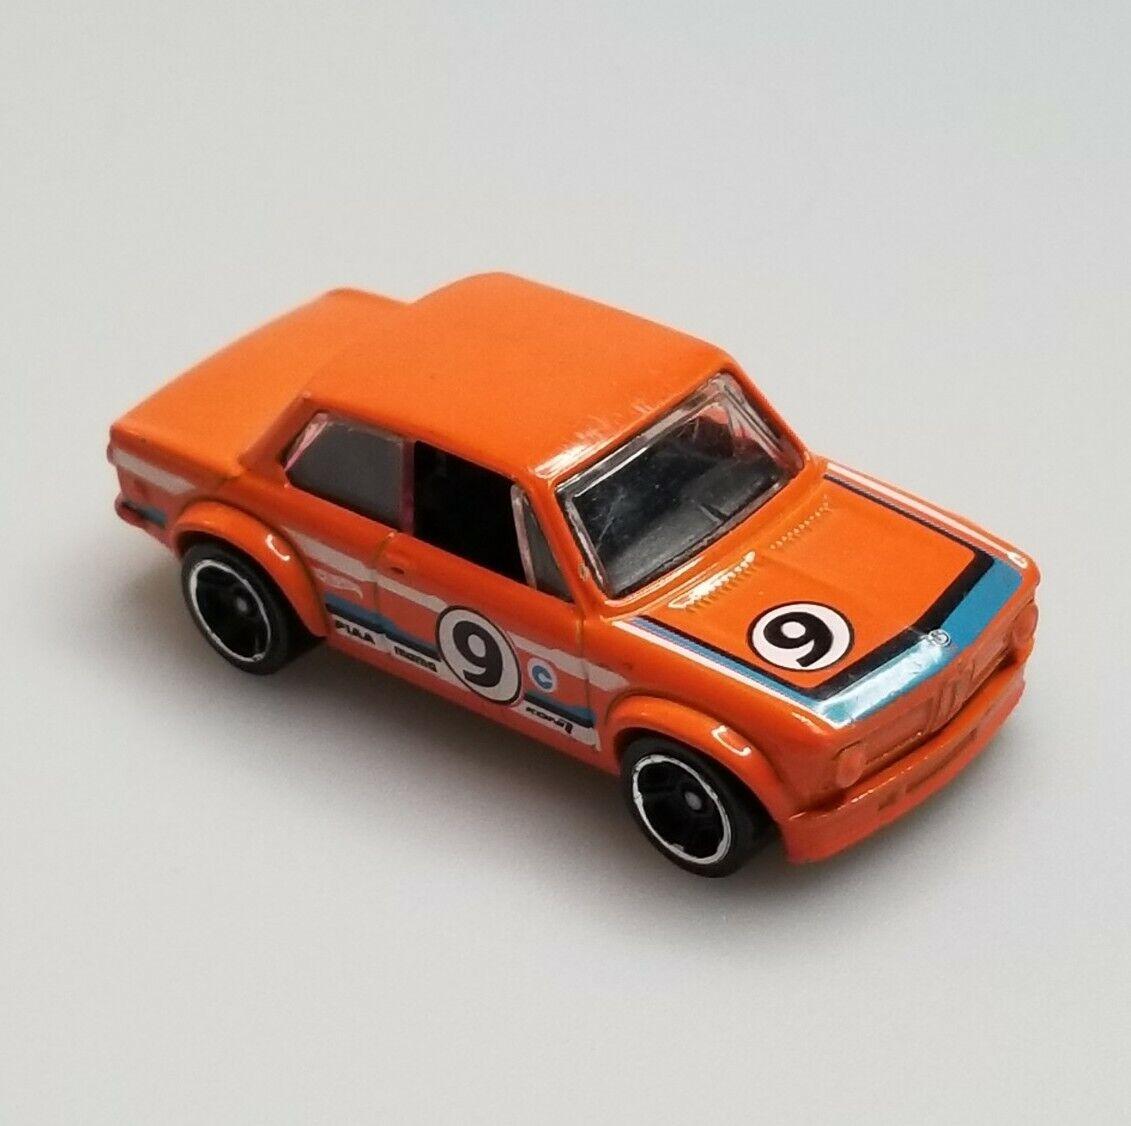 Mattel Hot Wheels Bmw 2002 Orange 2011 Item Rare For Sale Online Ebay